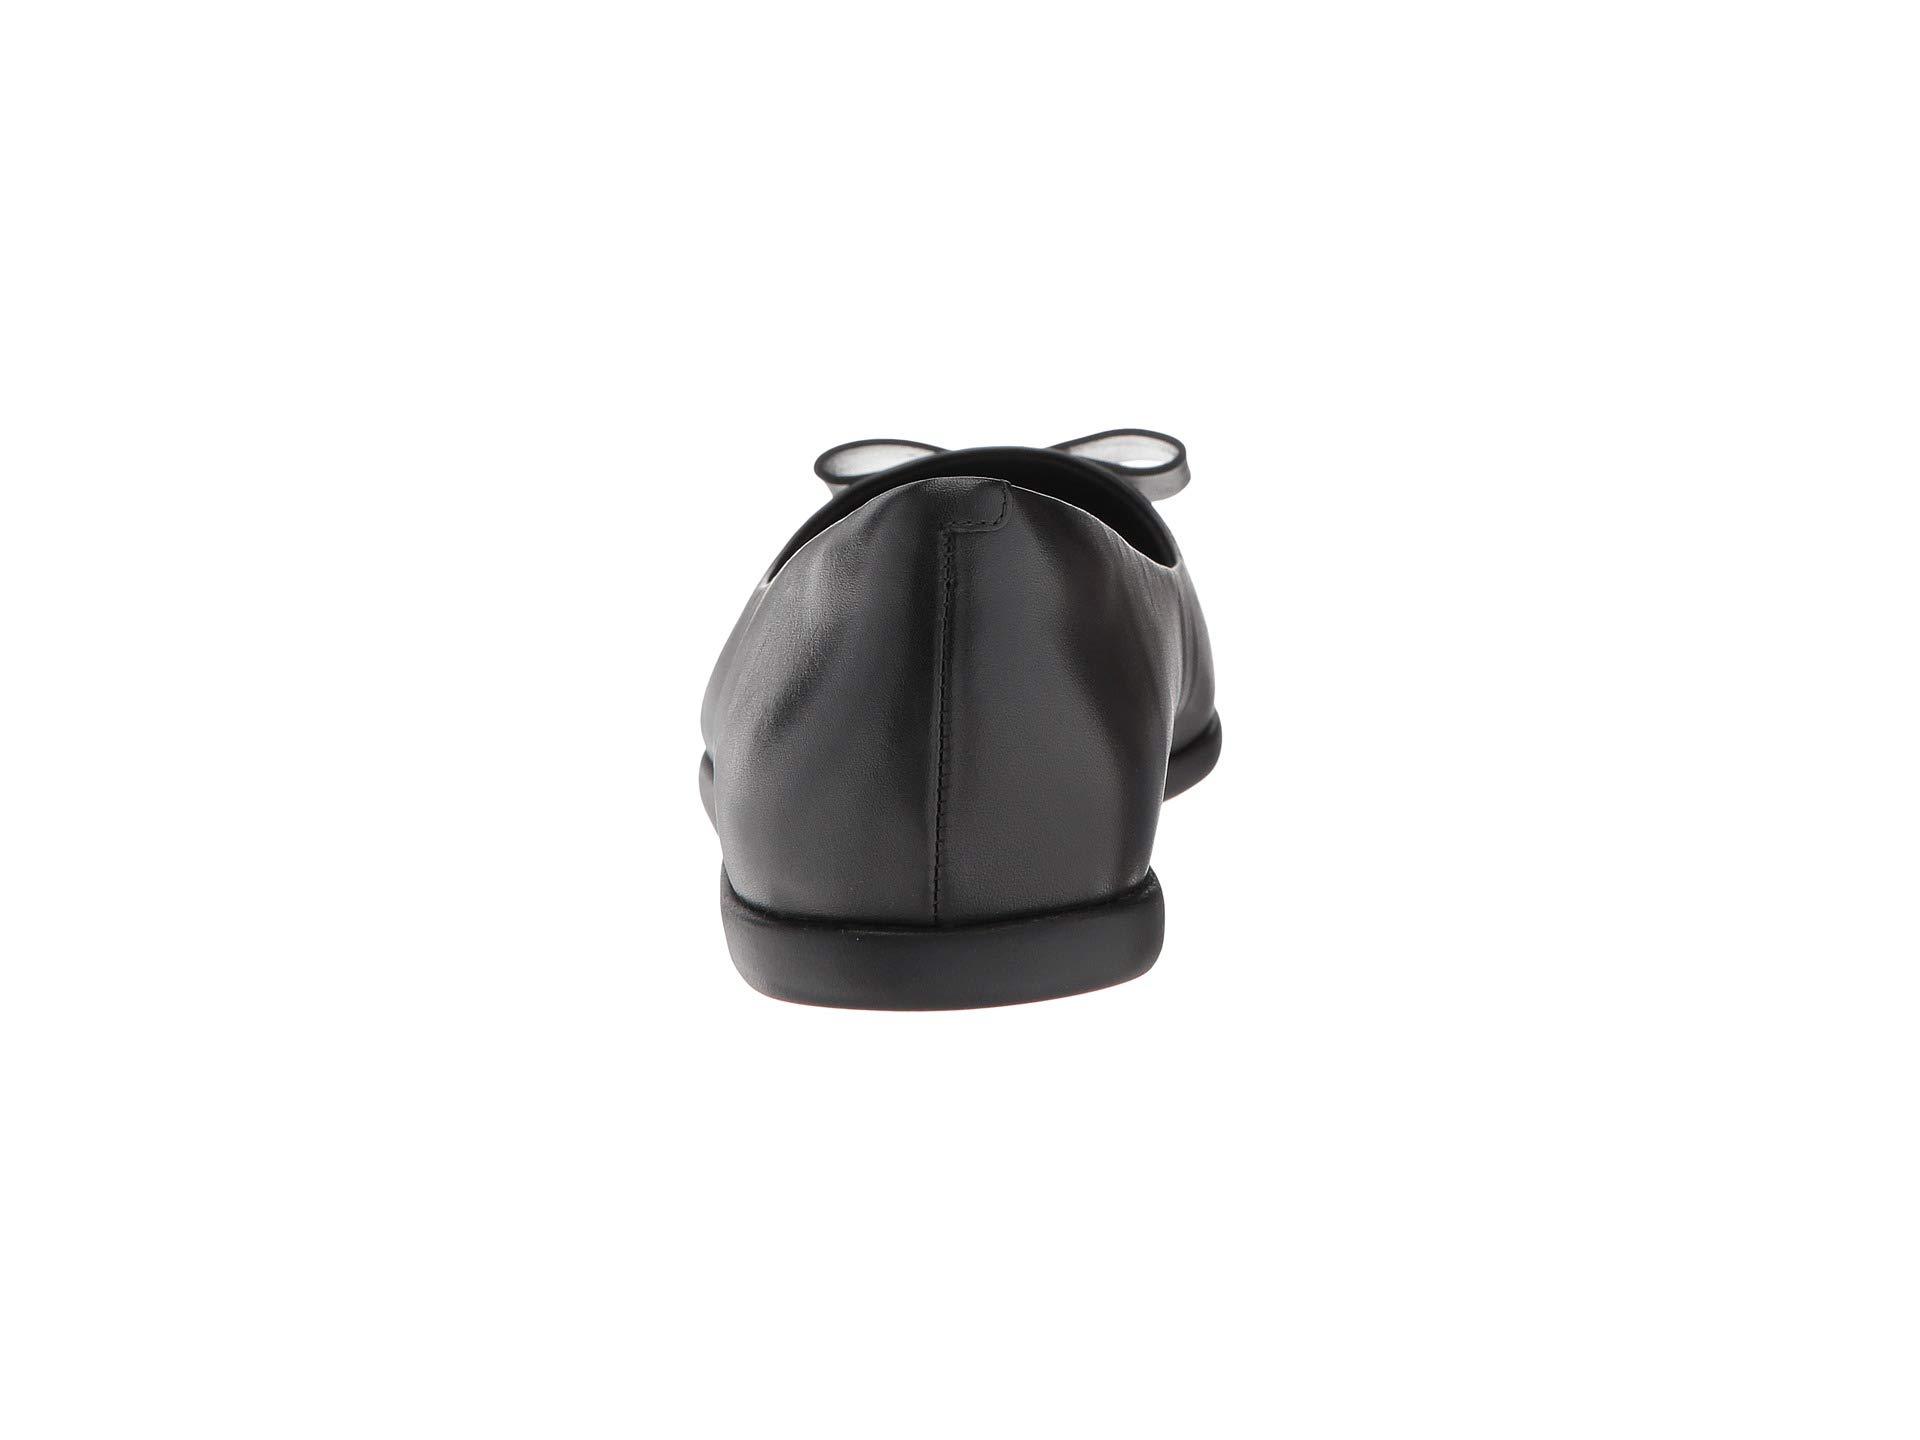 Leather 3 Haan Skimmer Cole Bow Black zerogrand 5YRwxq5Fz